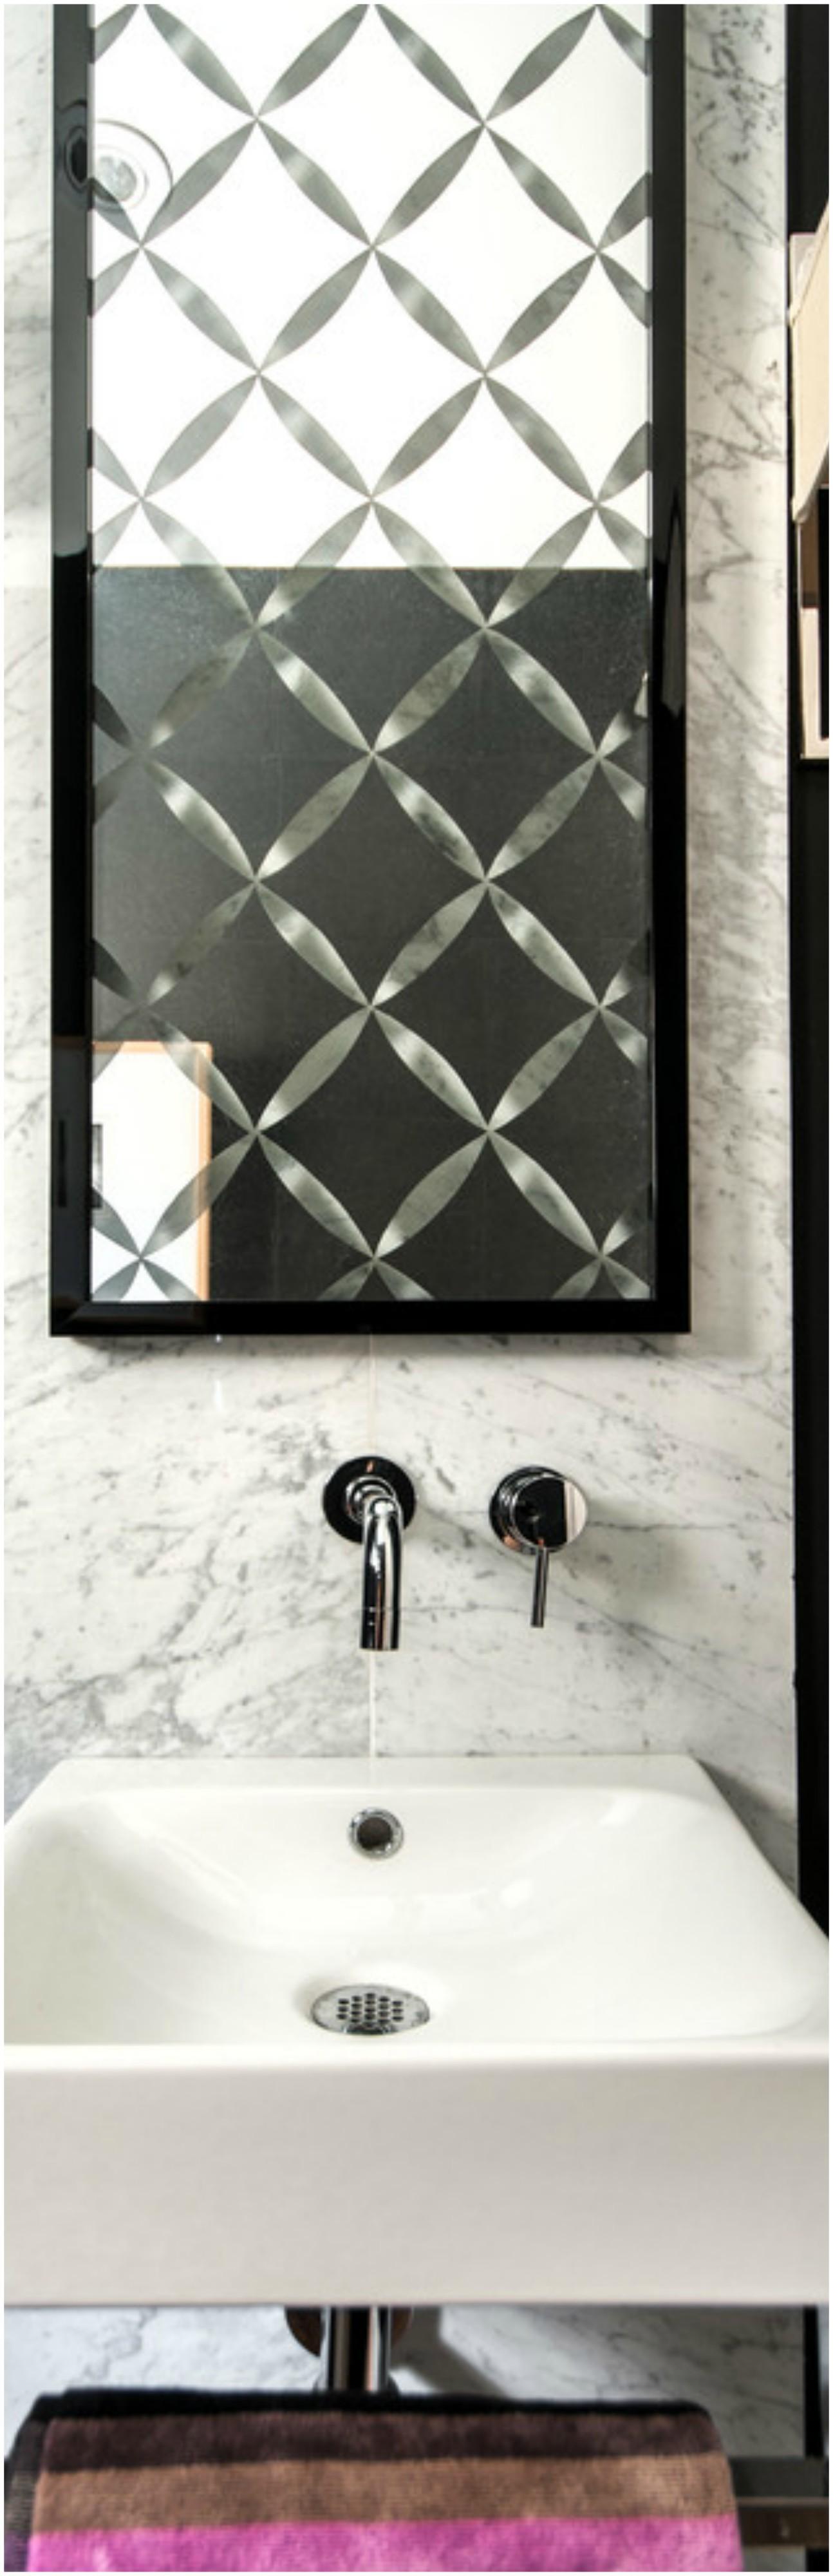 Bathroom Faucets Design Ideas (15)